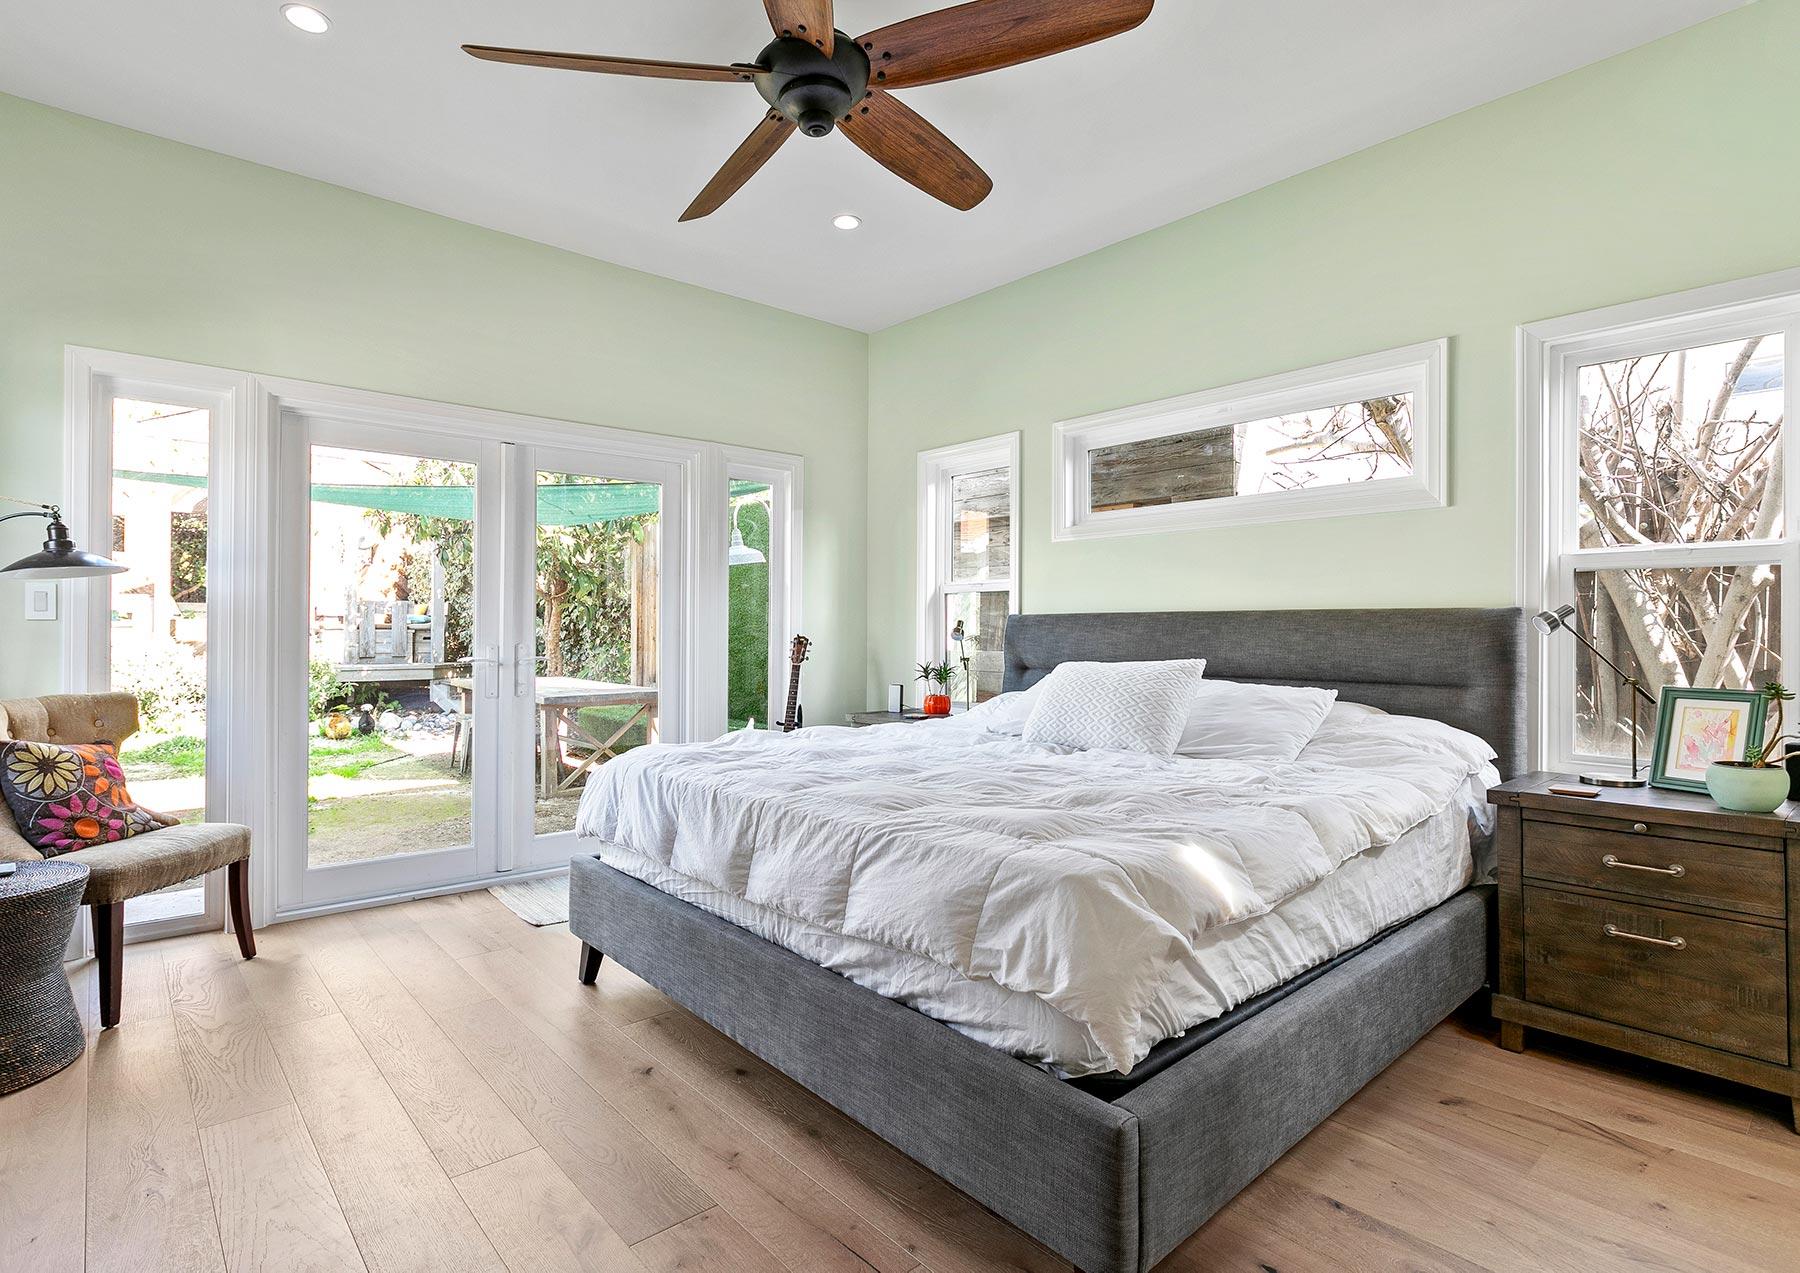 Highland park complete remodel bedroom 5 SMALL.jpg